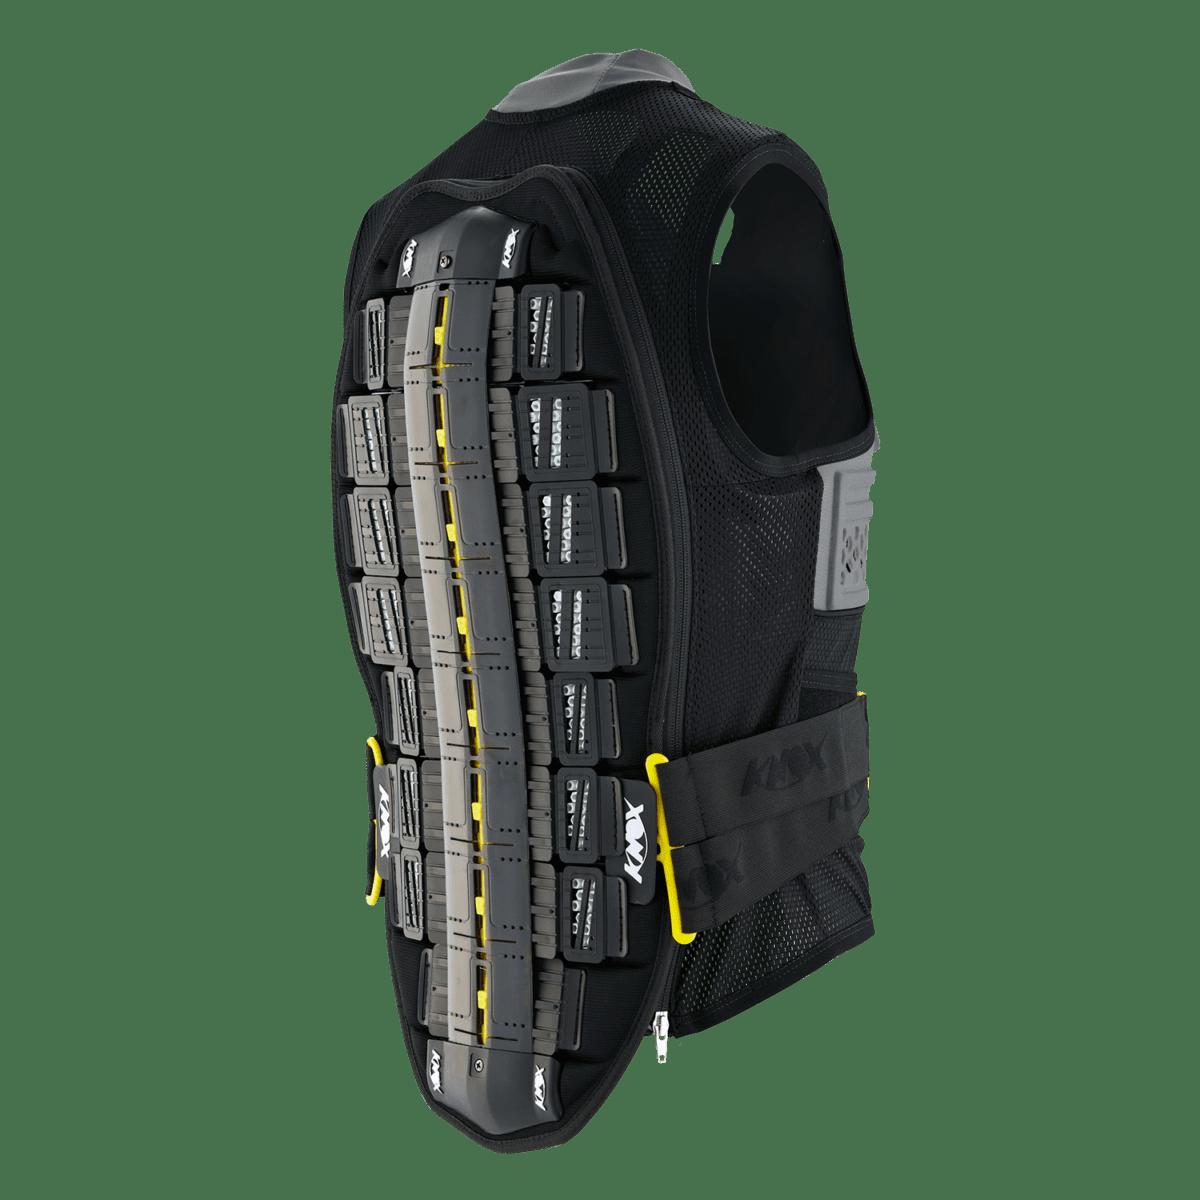 Knox Track Vest rear